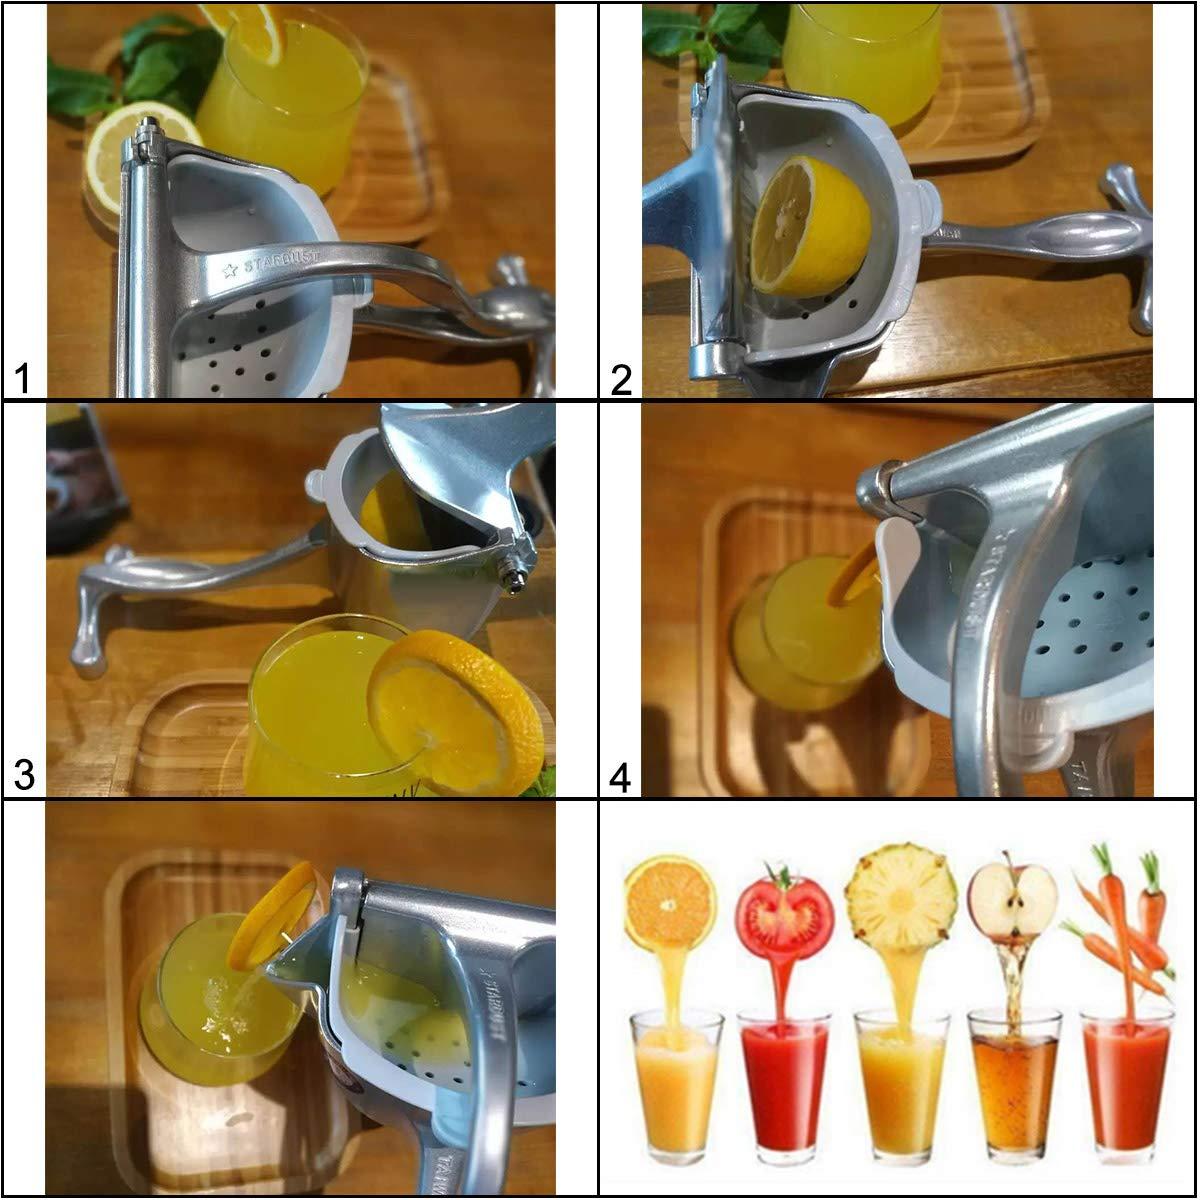 Homend Heavy Duty Single Press Aluminium Lemon Squeezer Manual Press Juicer Hand Press Fruit Juicer Silver